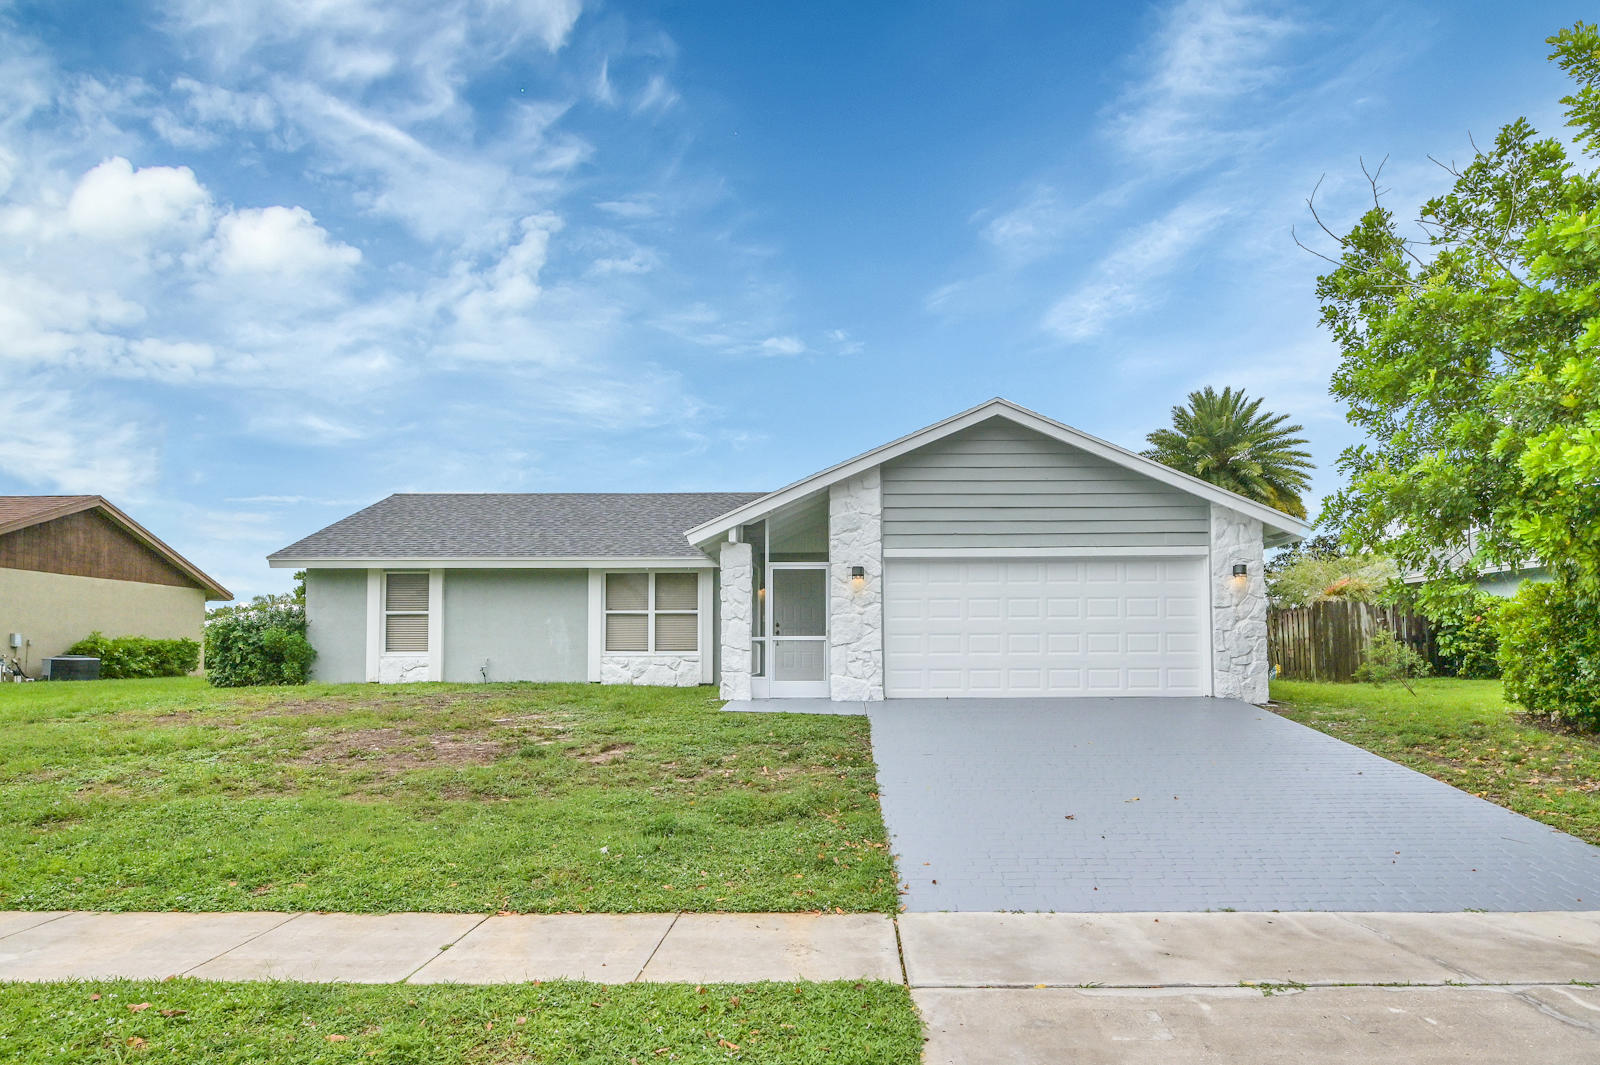 142  Miramar Avenue  For Sale 10732884, FL